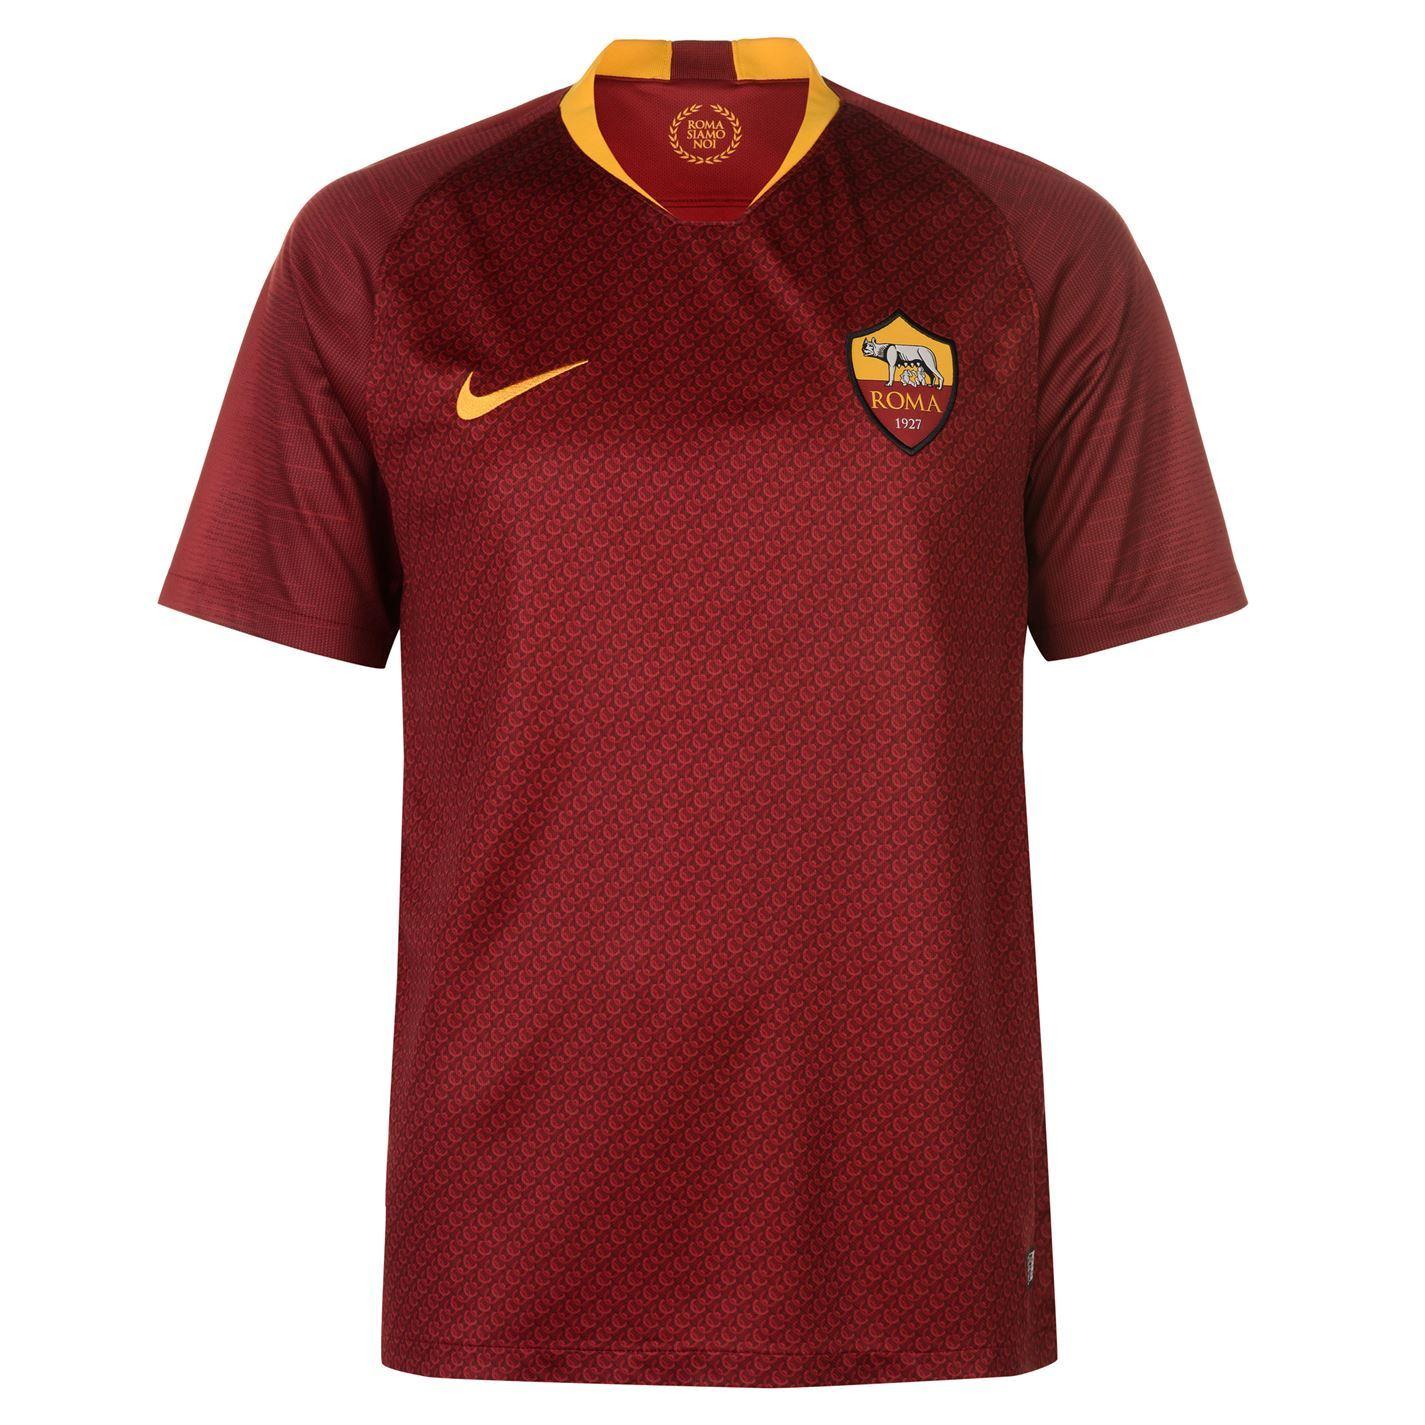 c0754d94d0e3 Nike AS Roma Home Jersey 2018 2019 Mens Red Gold Football Soccer Fan Shirt  Top